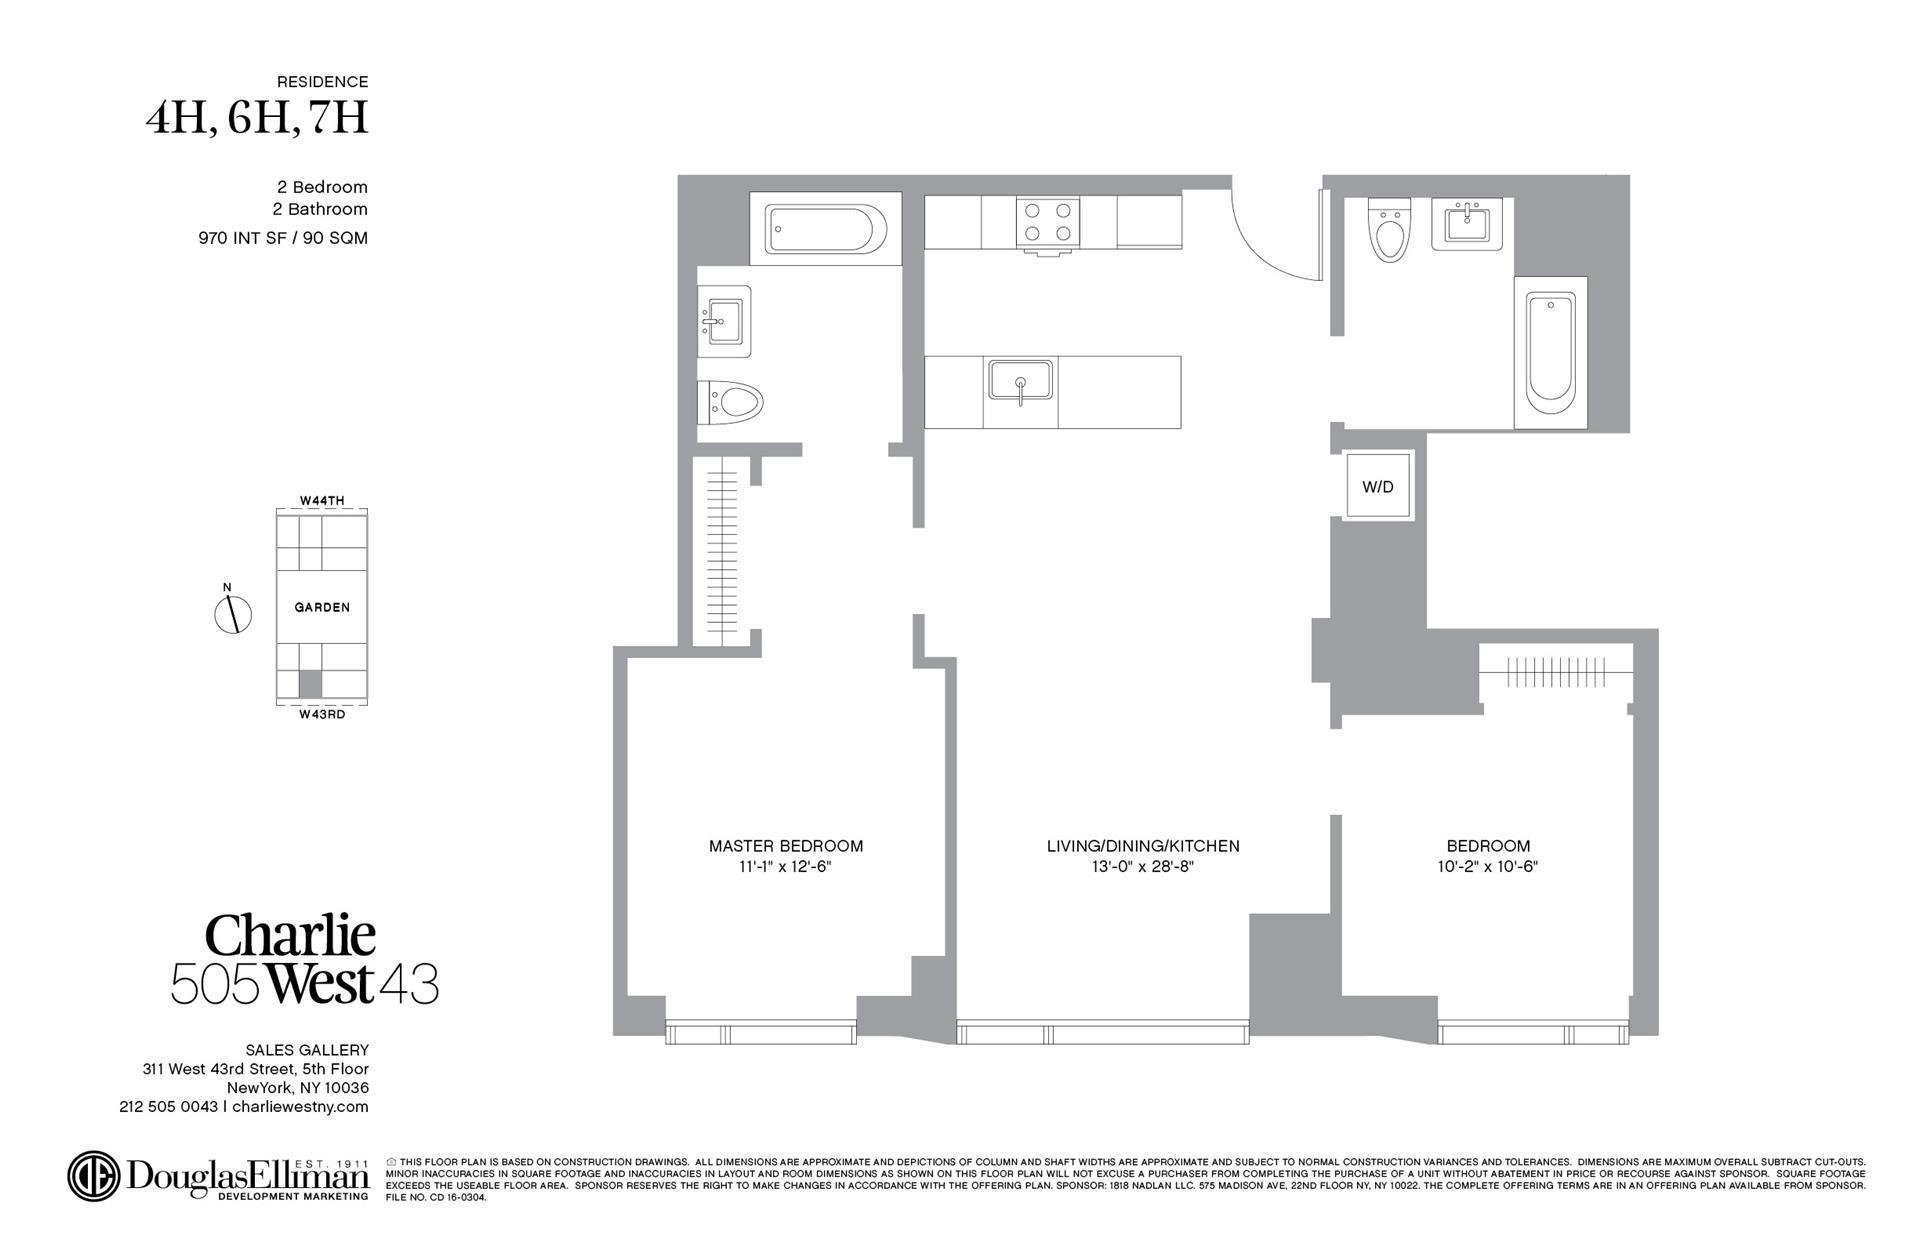 Floor plan of 505 West 43rd St, 4H - Clinton, New York